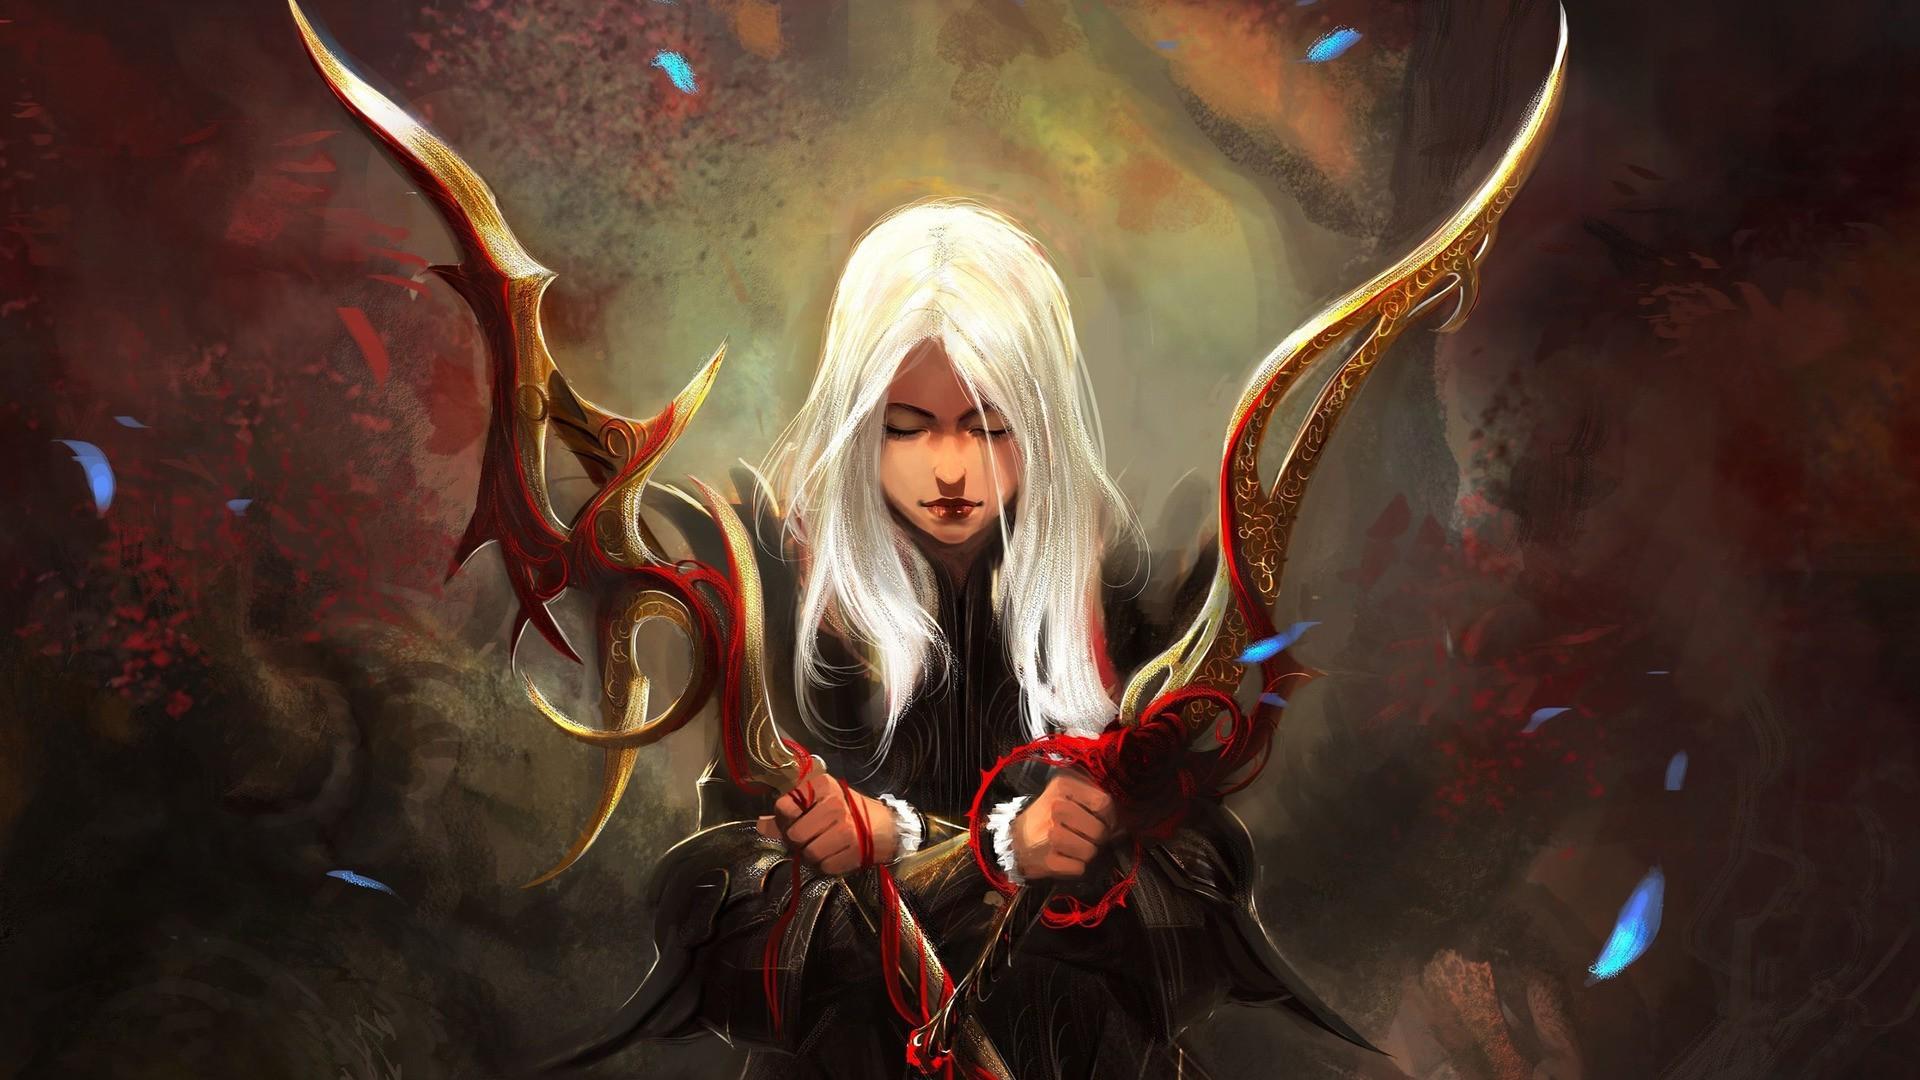 artwork, Fantasy Art, Women, Warrior, Concept Art Wallpapers HD / Desktop  and Mobile Backgrounds